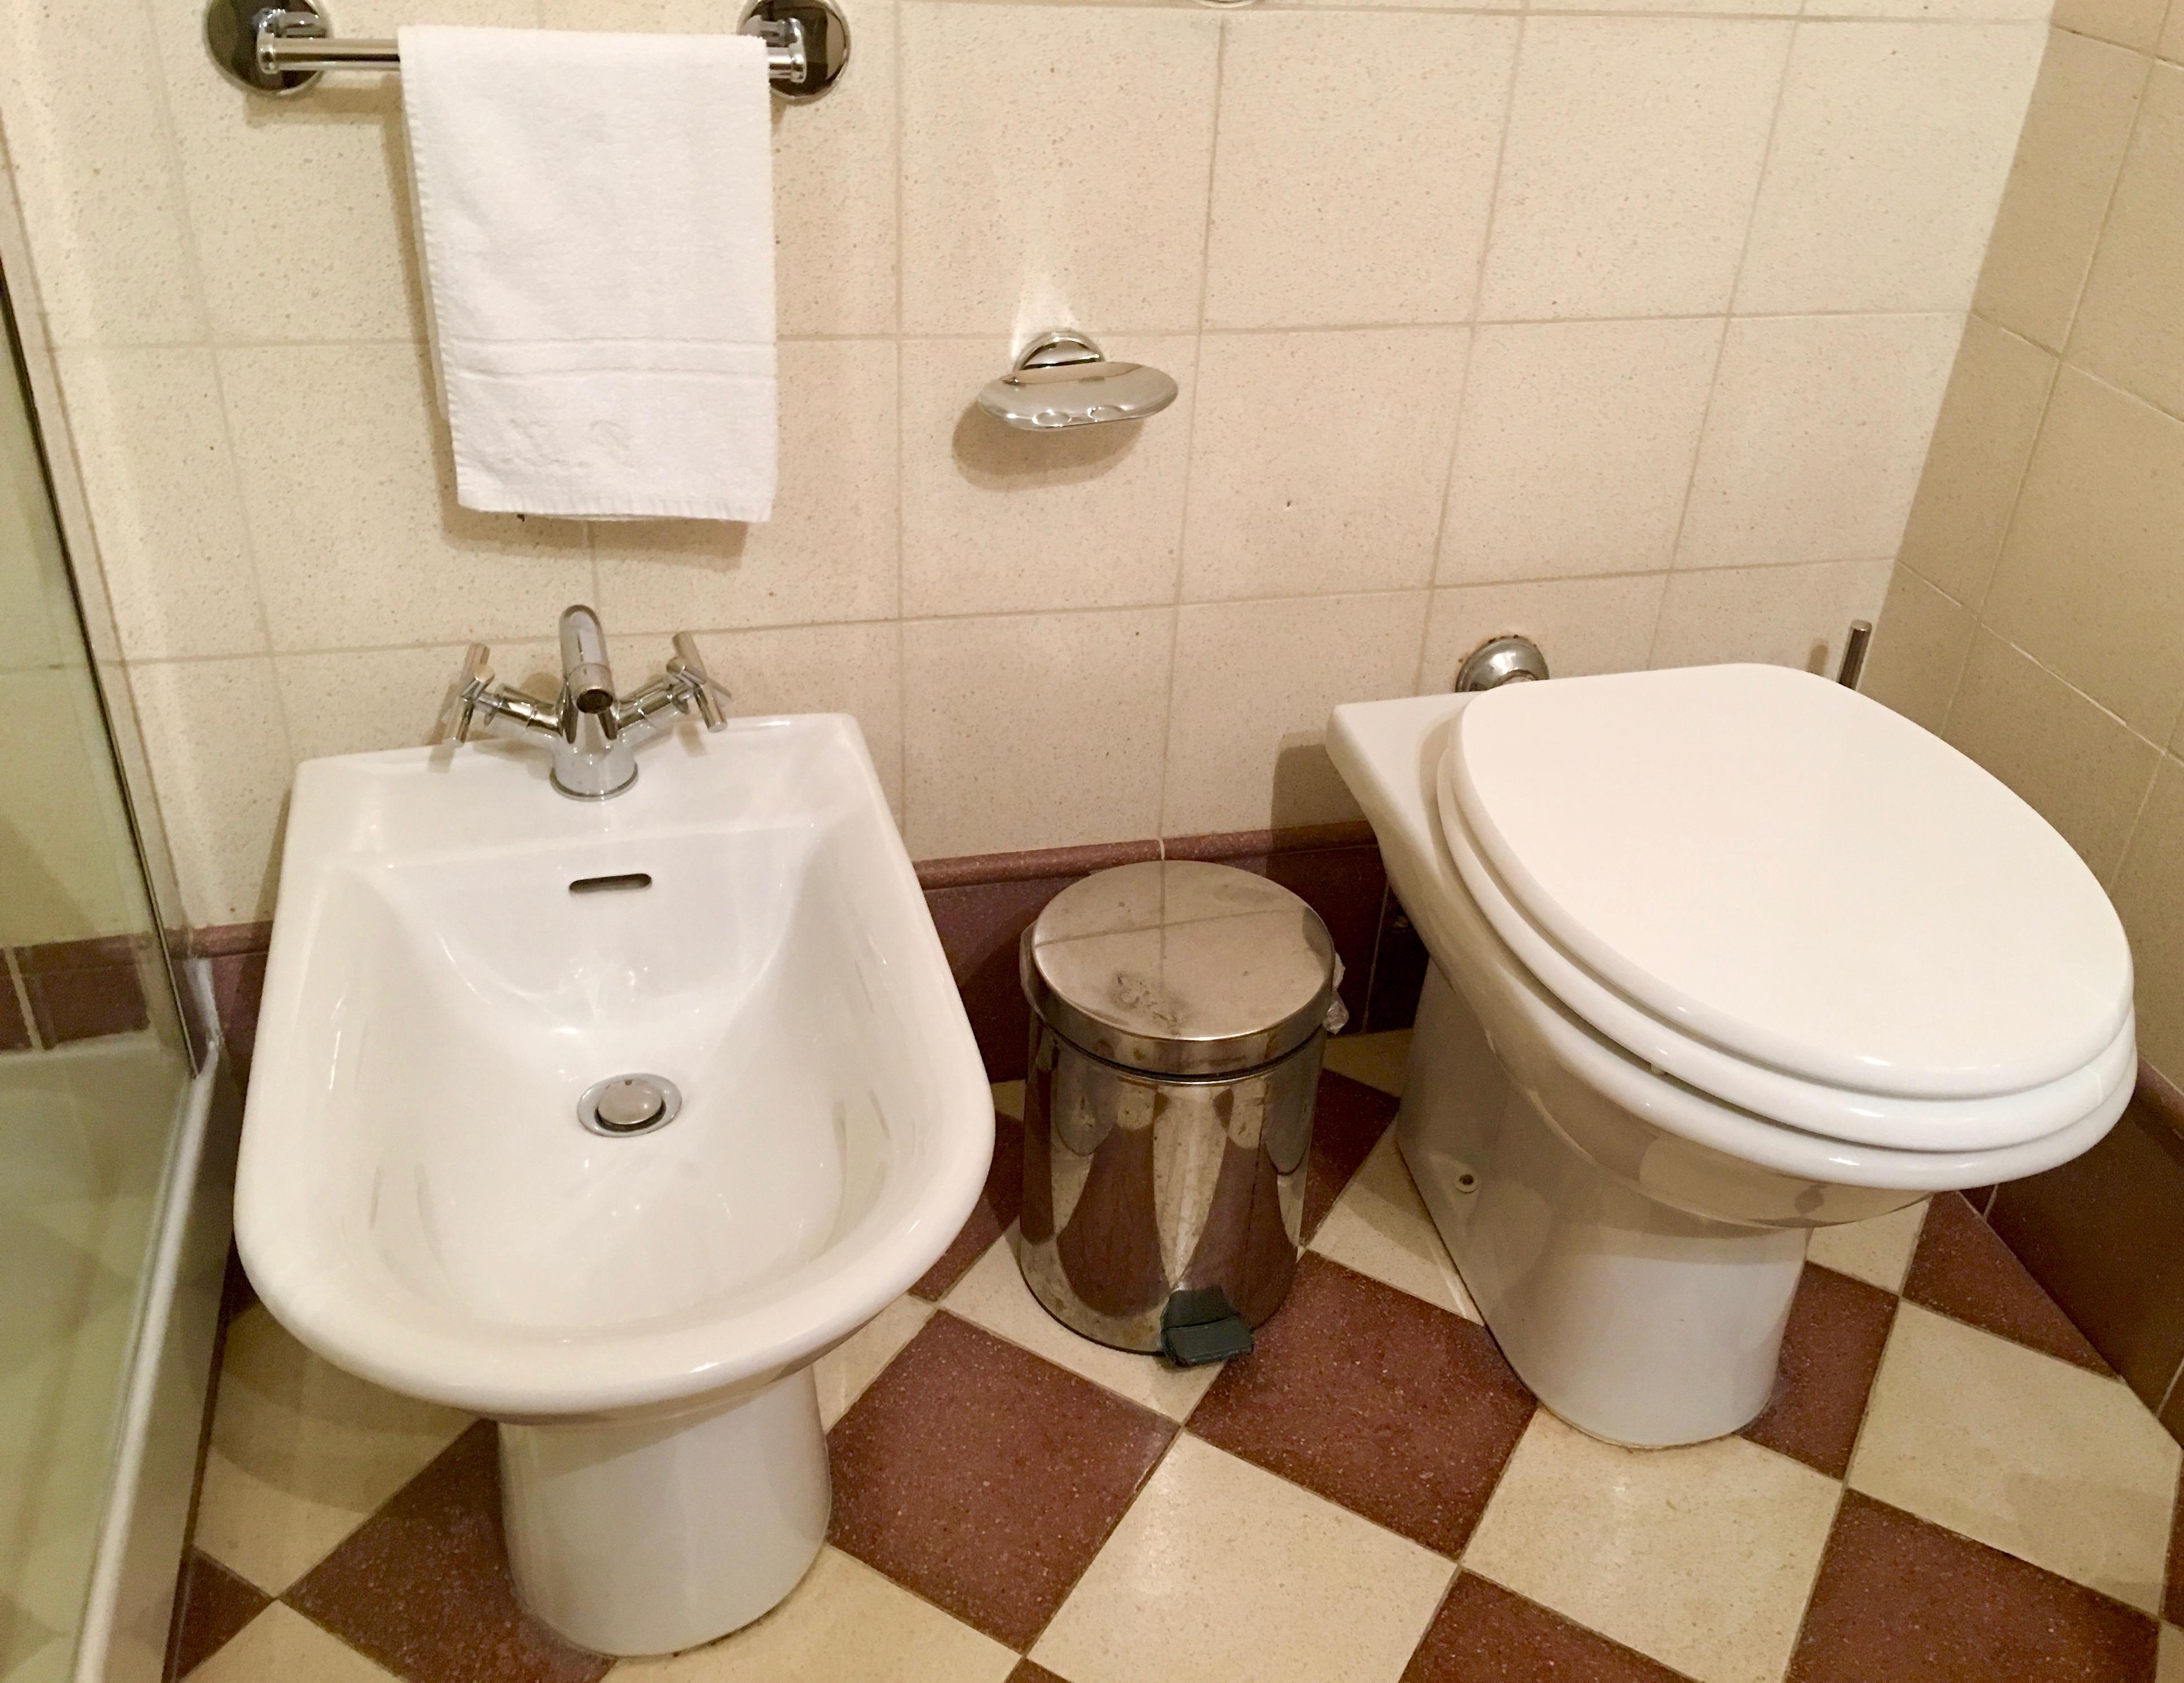 with whirlpool bidet bathroom toto admirable skipset combo your residence toilet idea australia